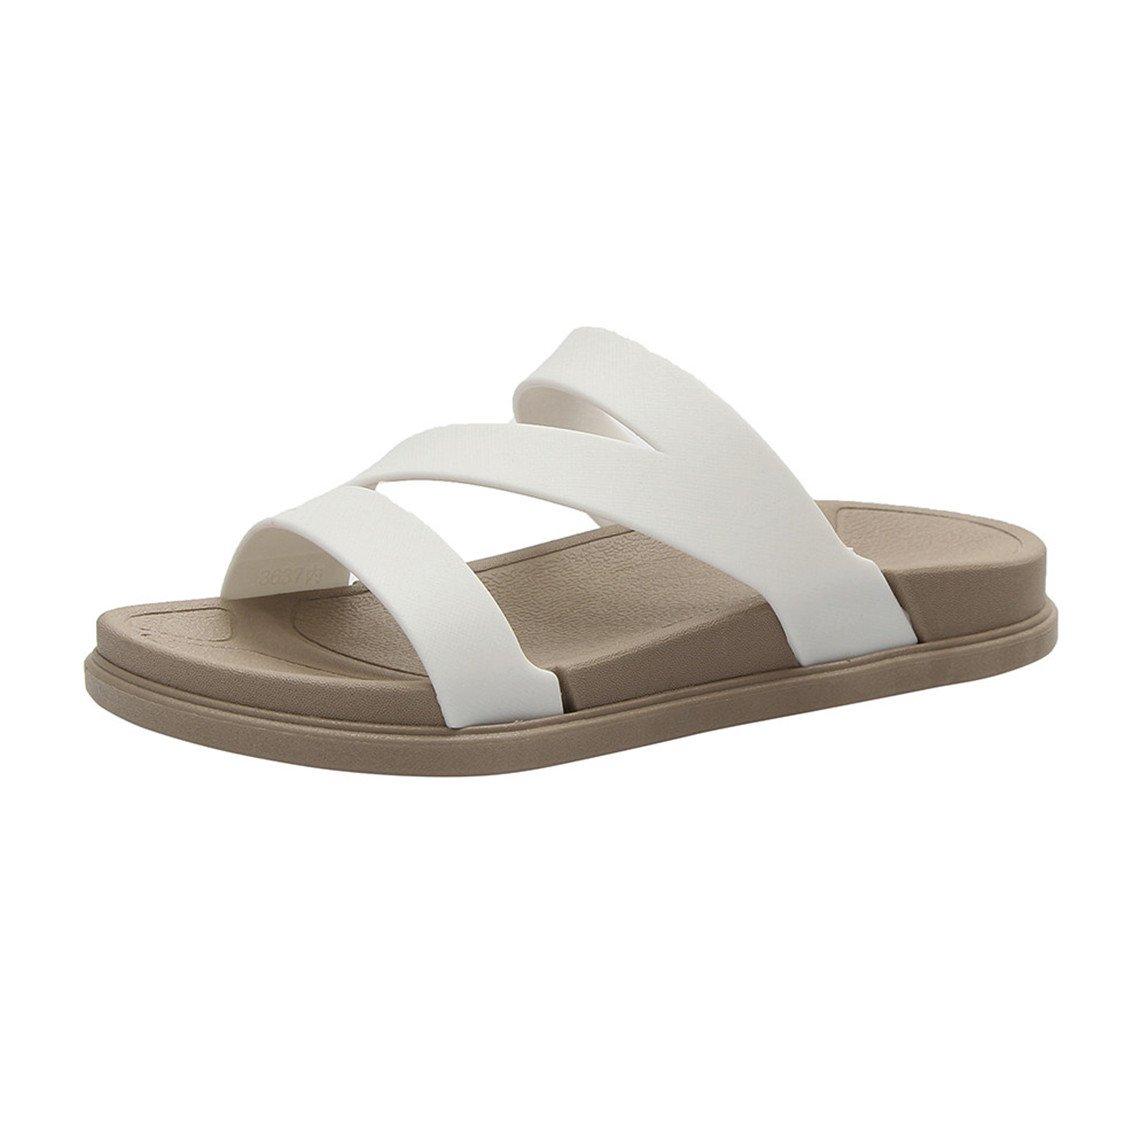 2018 New Ladies Summer Beach Bath Slippers Casual Wedge Sandals Women Shoes B07BNLDFGJ 5 B(M) US|White